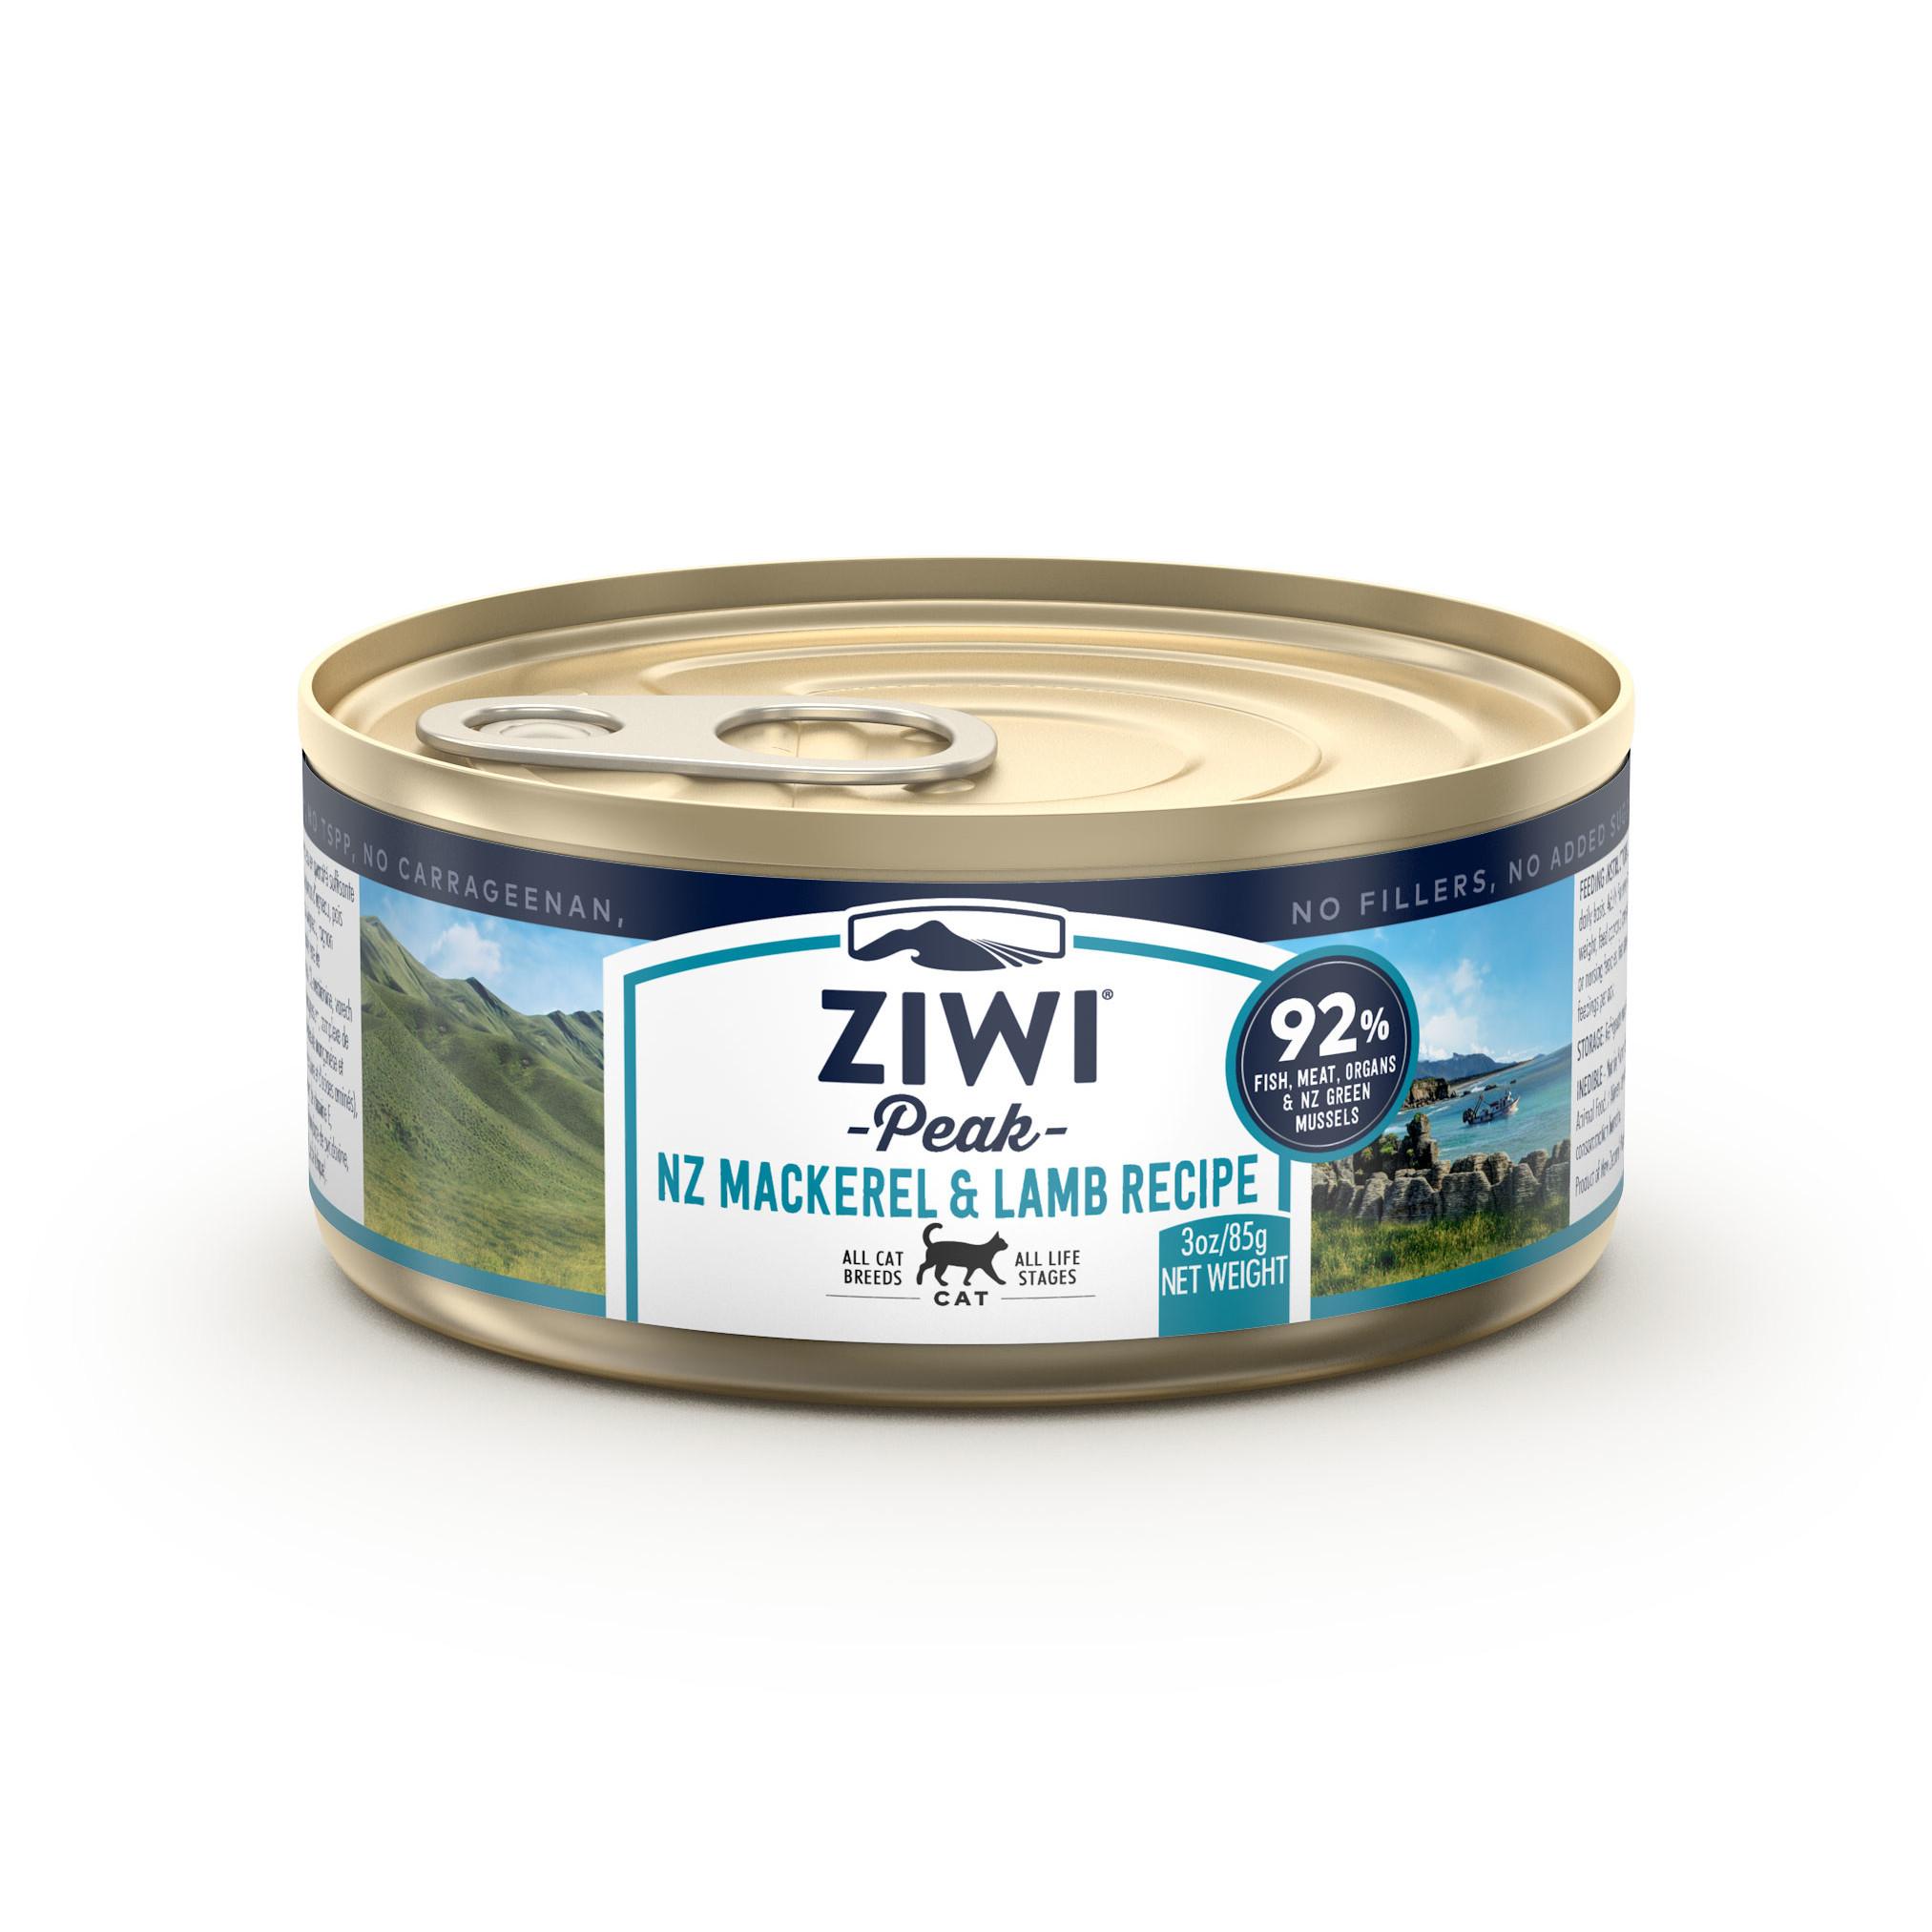 ZIWI Peak Canned Cat Food Mackerel & Lamb Recipe, 3-oz|85.2-g